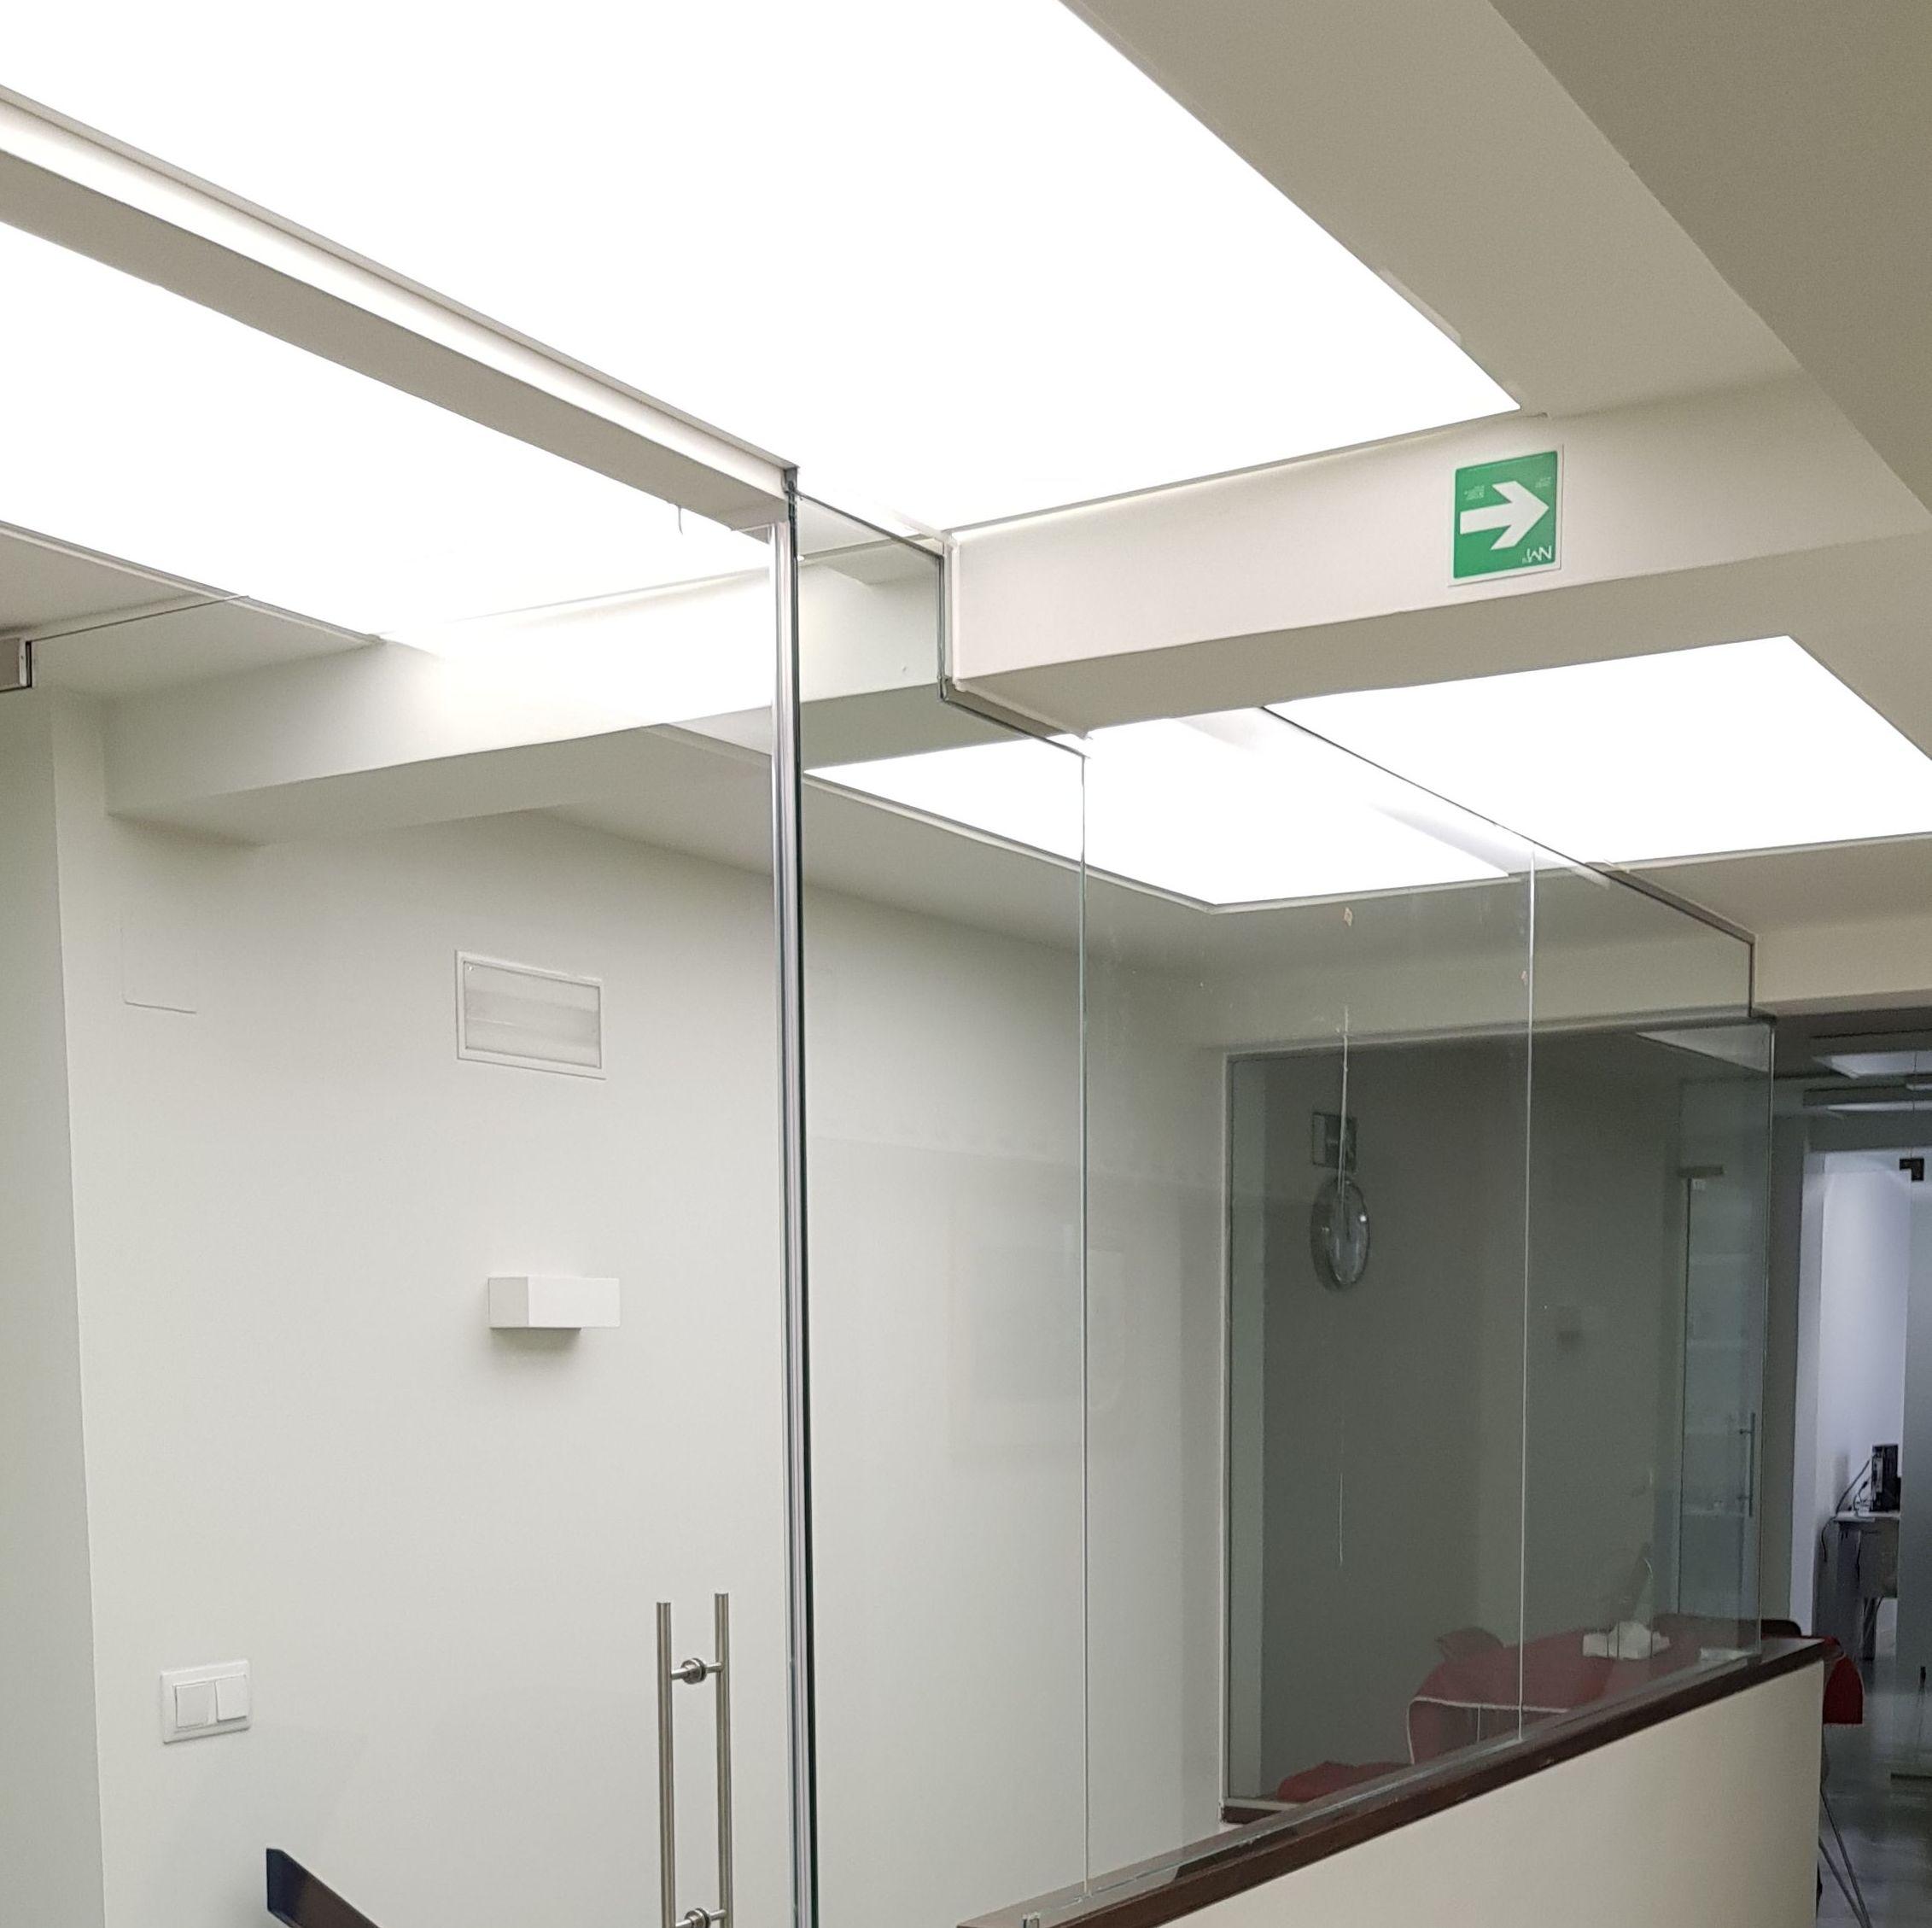 cristaleria-formas-tiro de escalera-vidrio templado